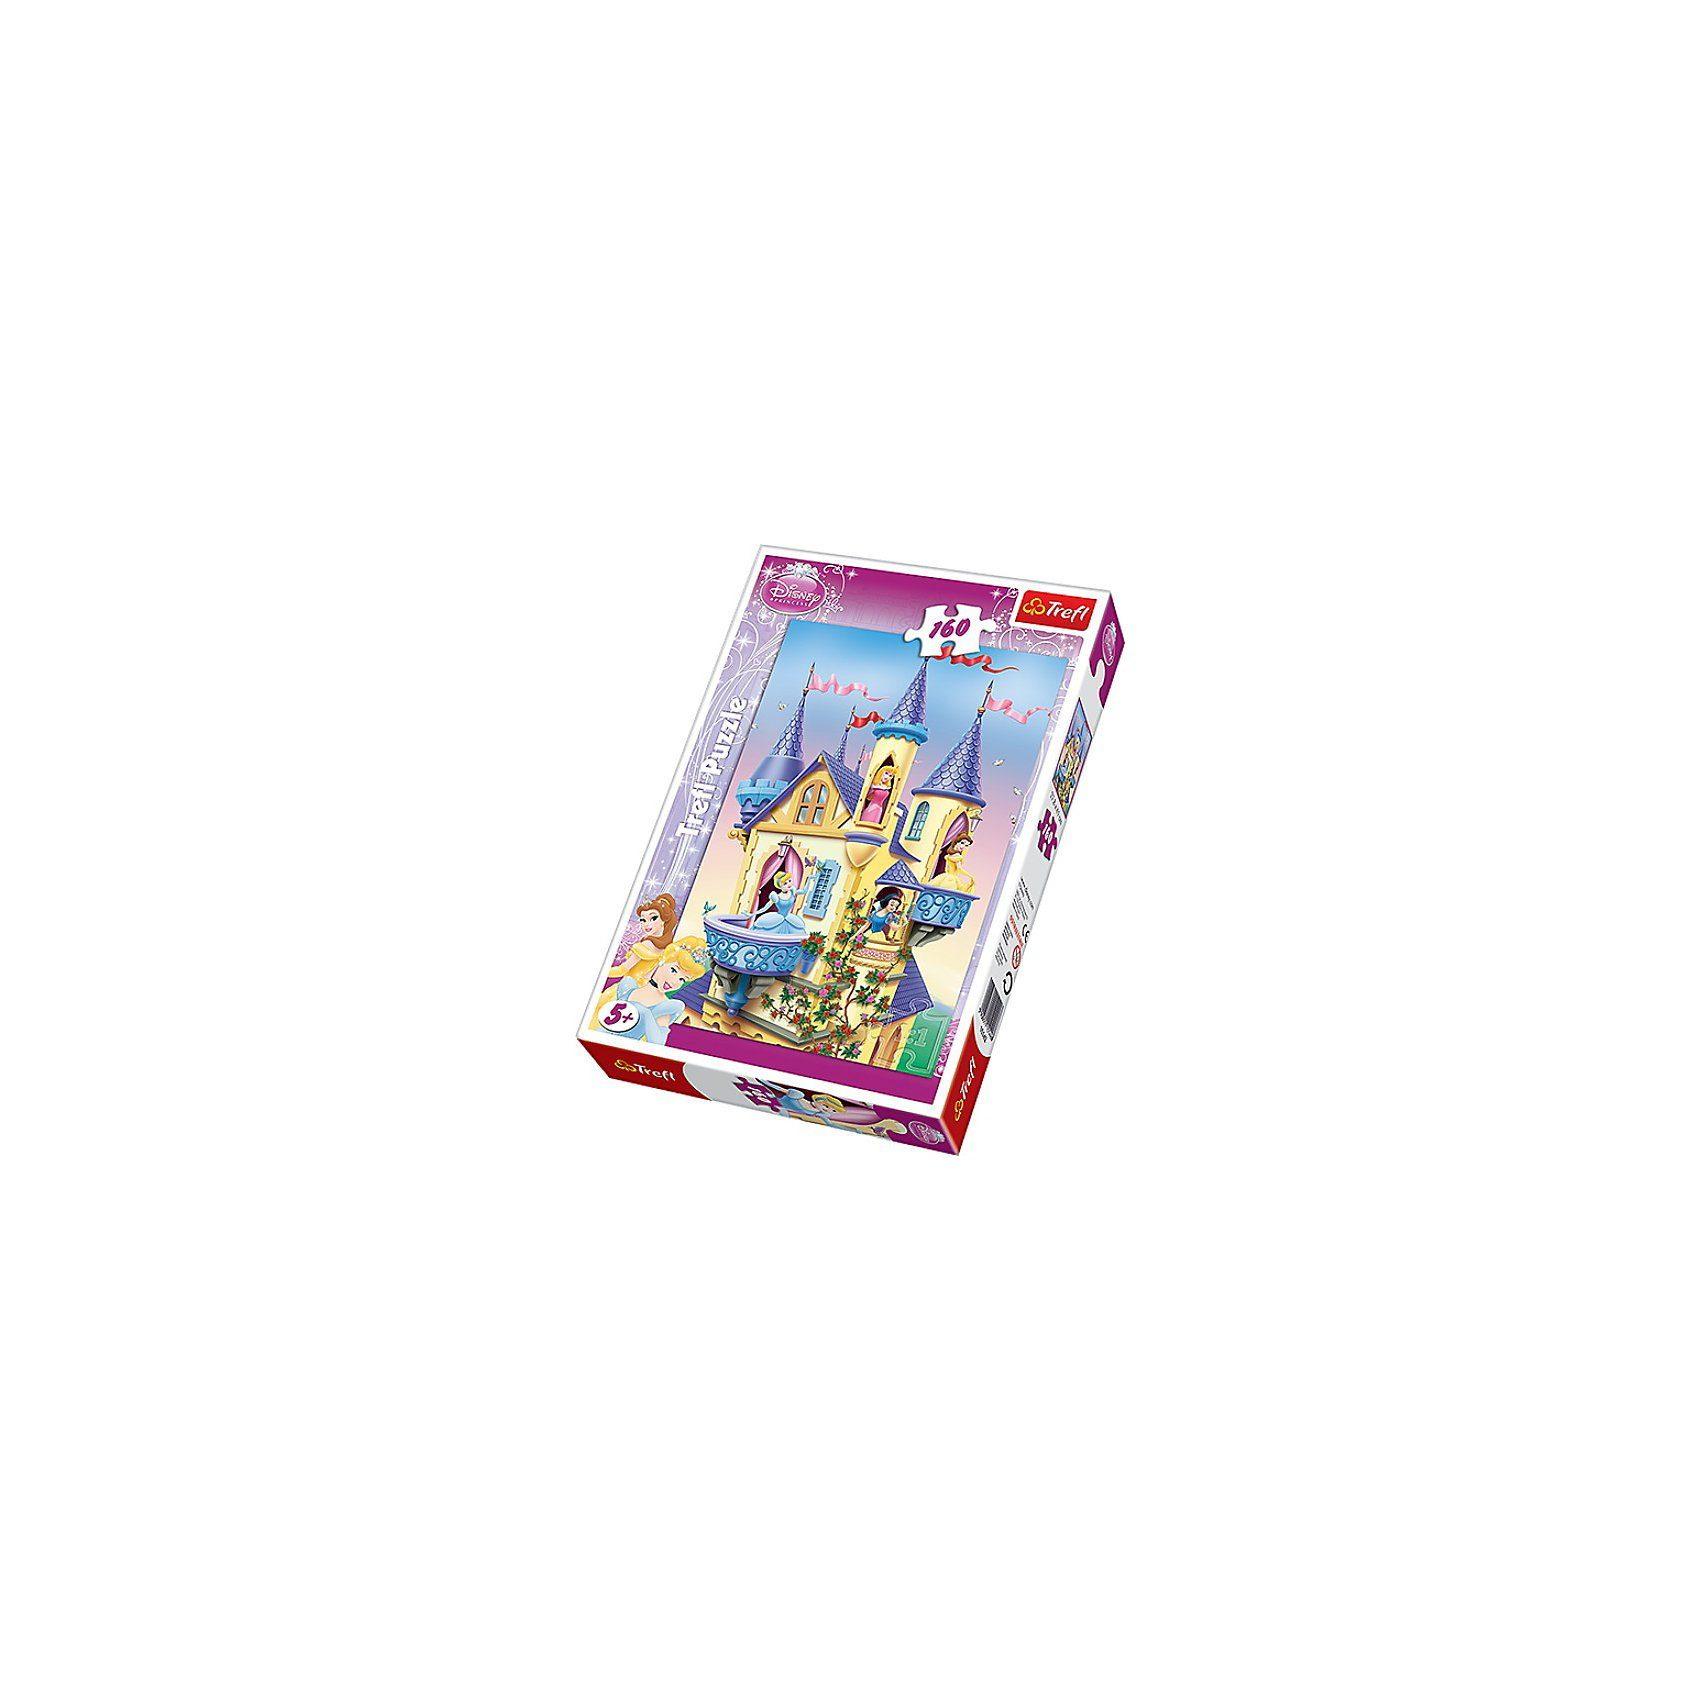 Trefl Puzzle 160 Teile - Disney Princess Palast